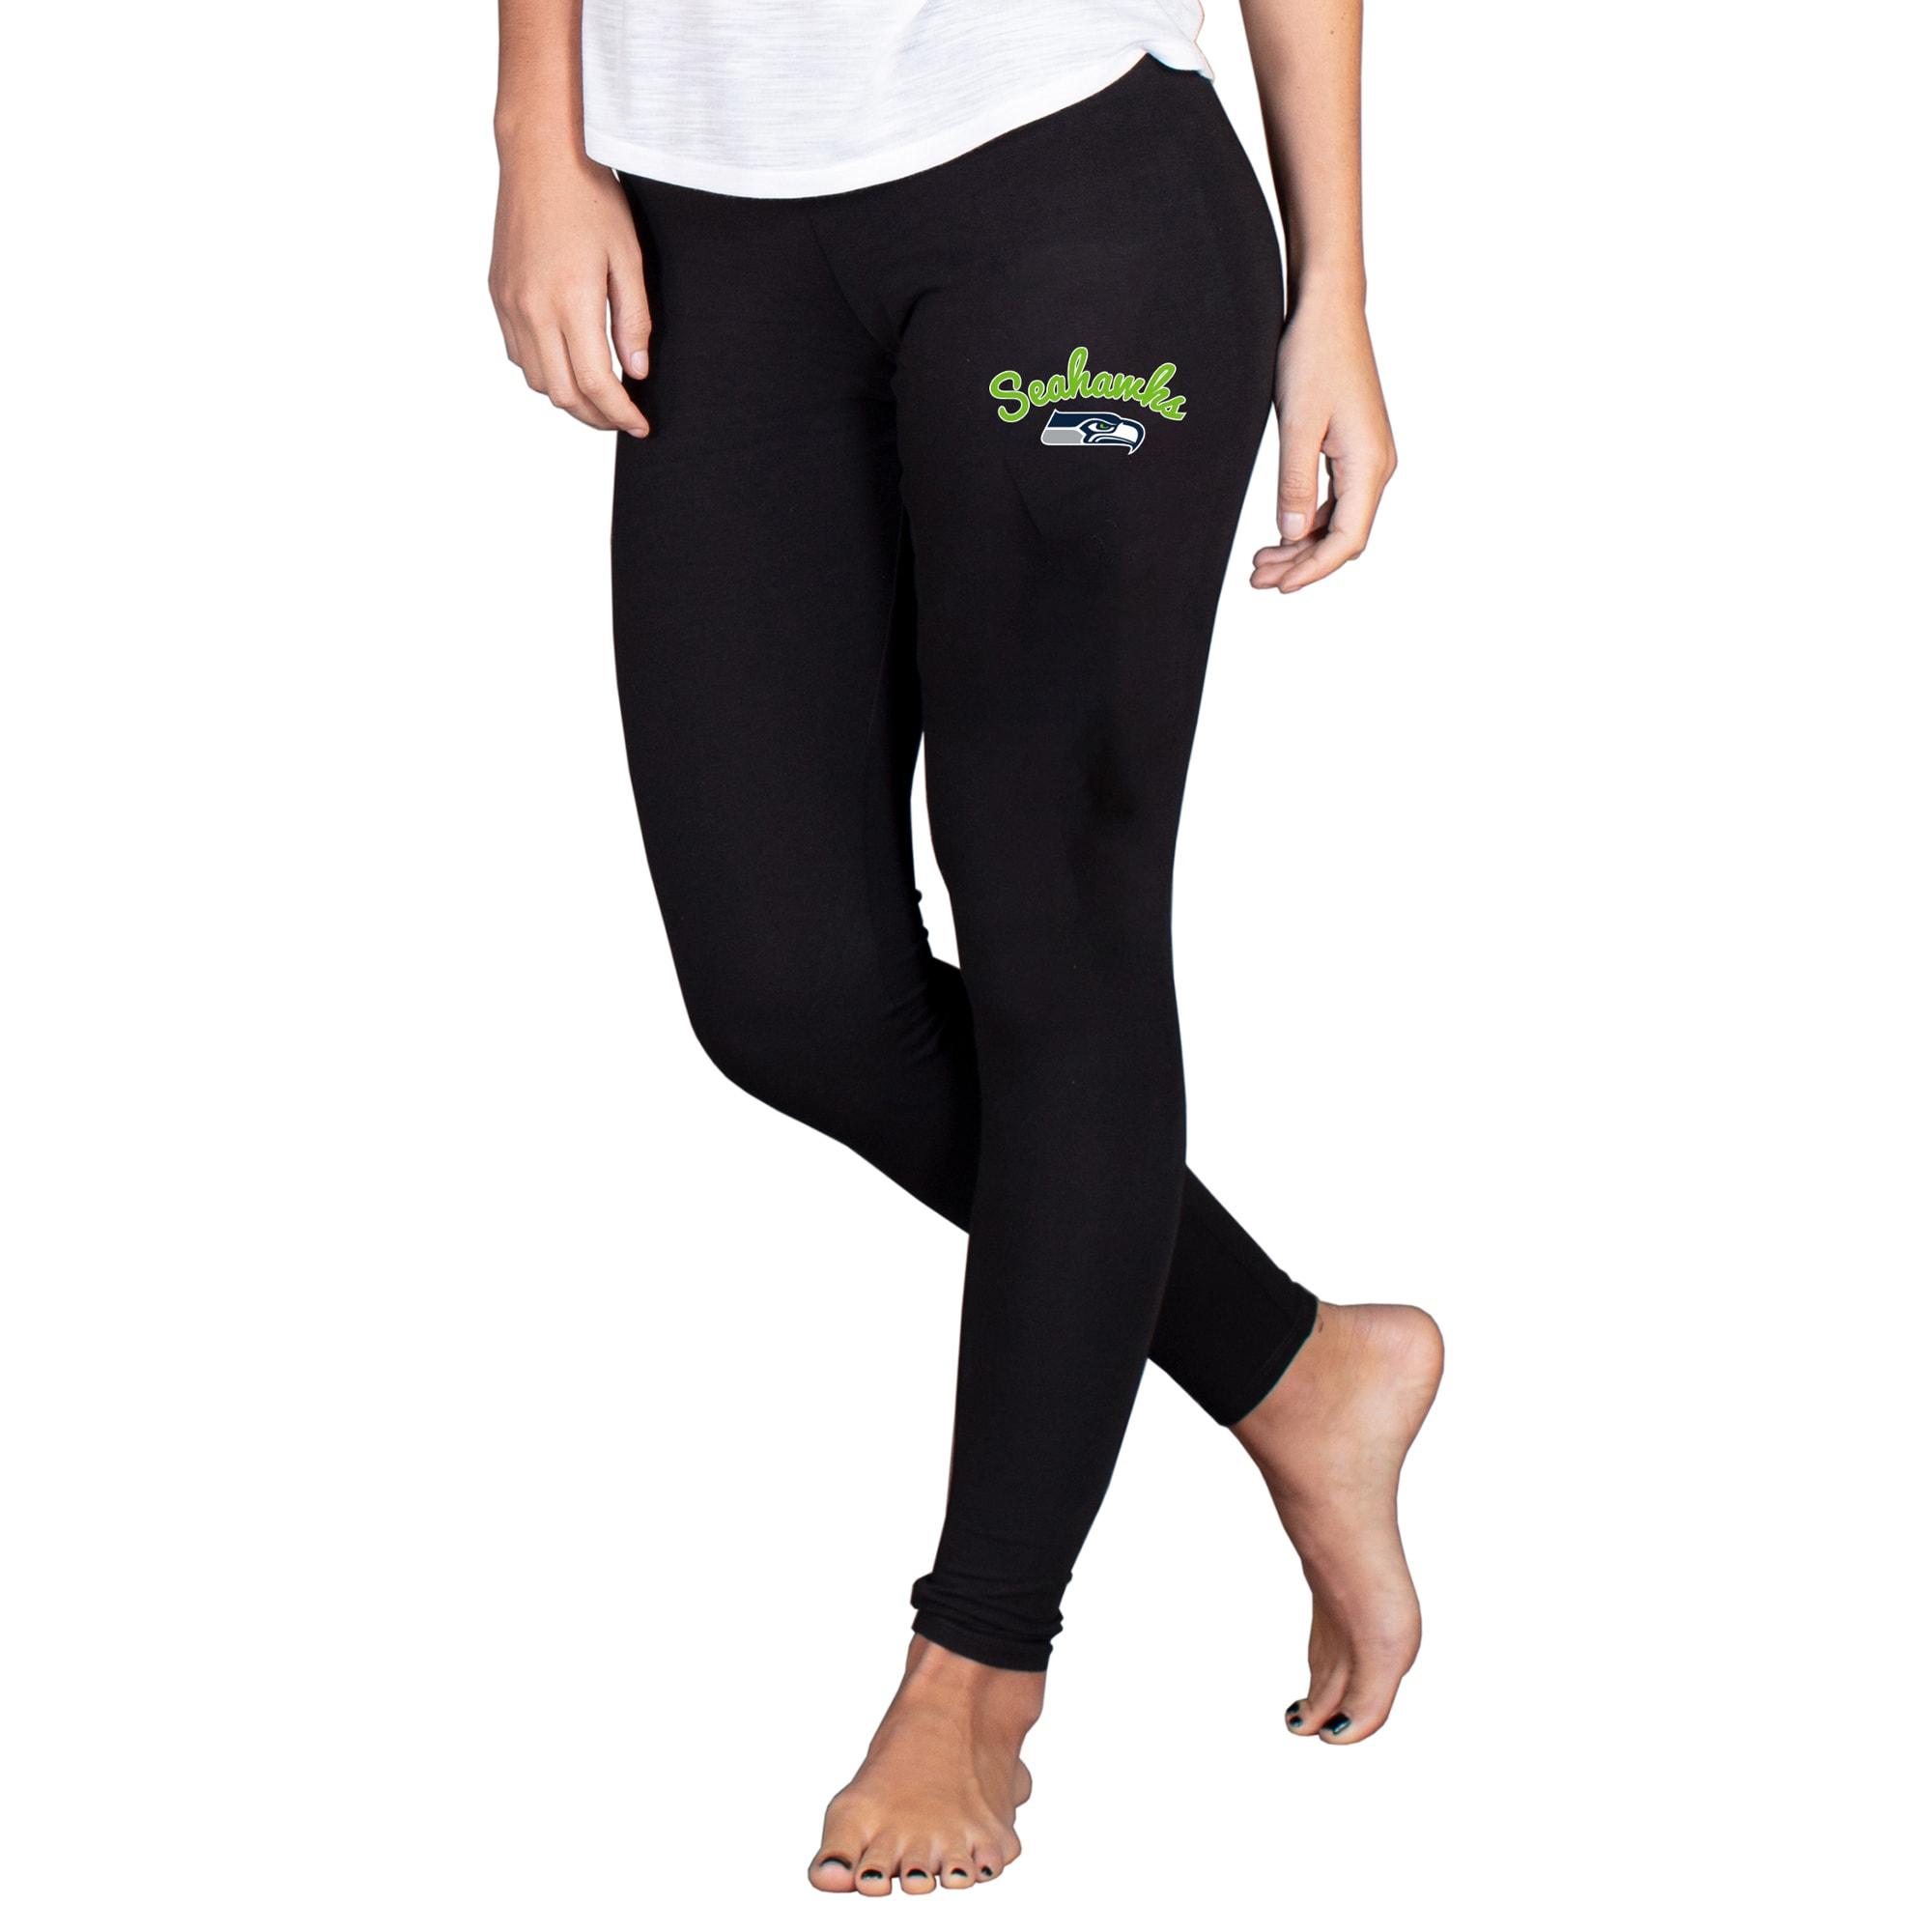 Seattle Seahawks Concepts Sport Women's Fraction Leggings - Black